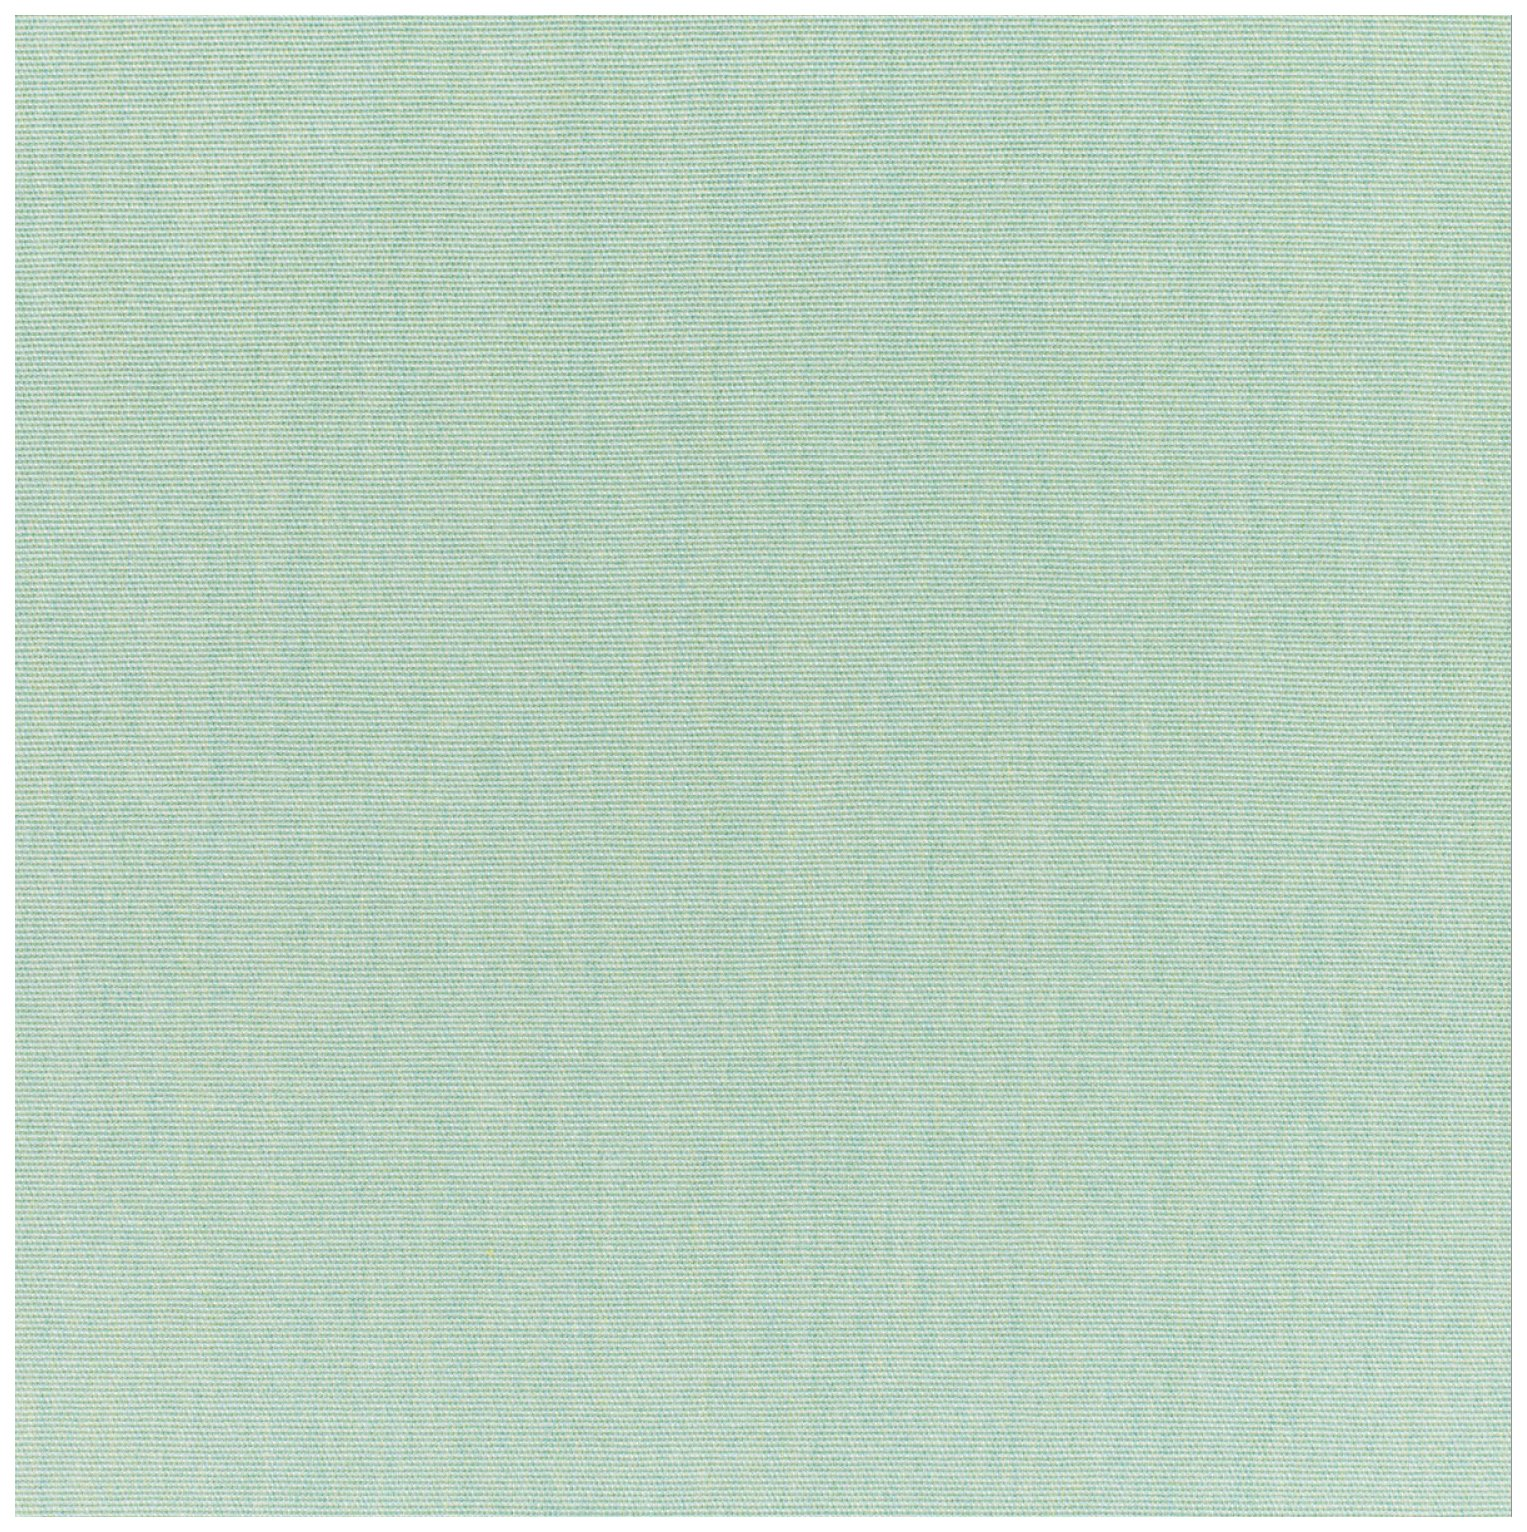 Hospitality Rattan X-9228-CUSH Optional Cushions for Soho Daybed, Sunbrella Canvas Spa